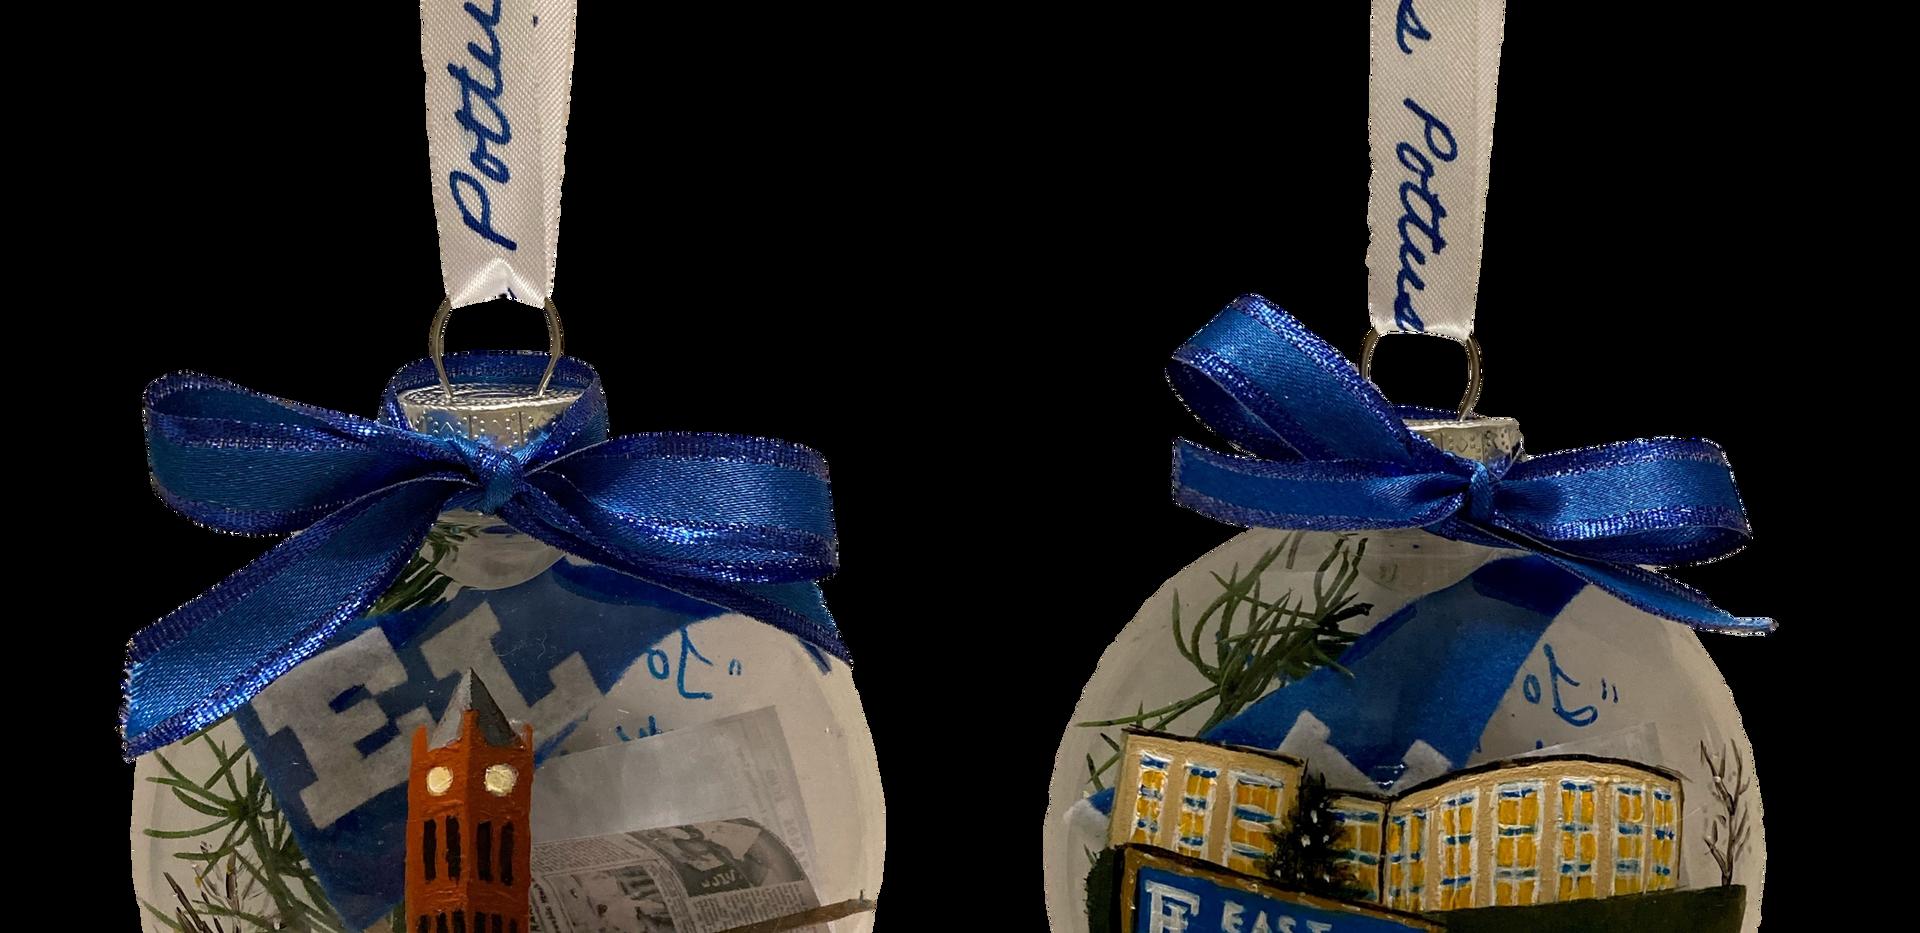 2021 Christmas Ornaments for sale on ELHSAA